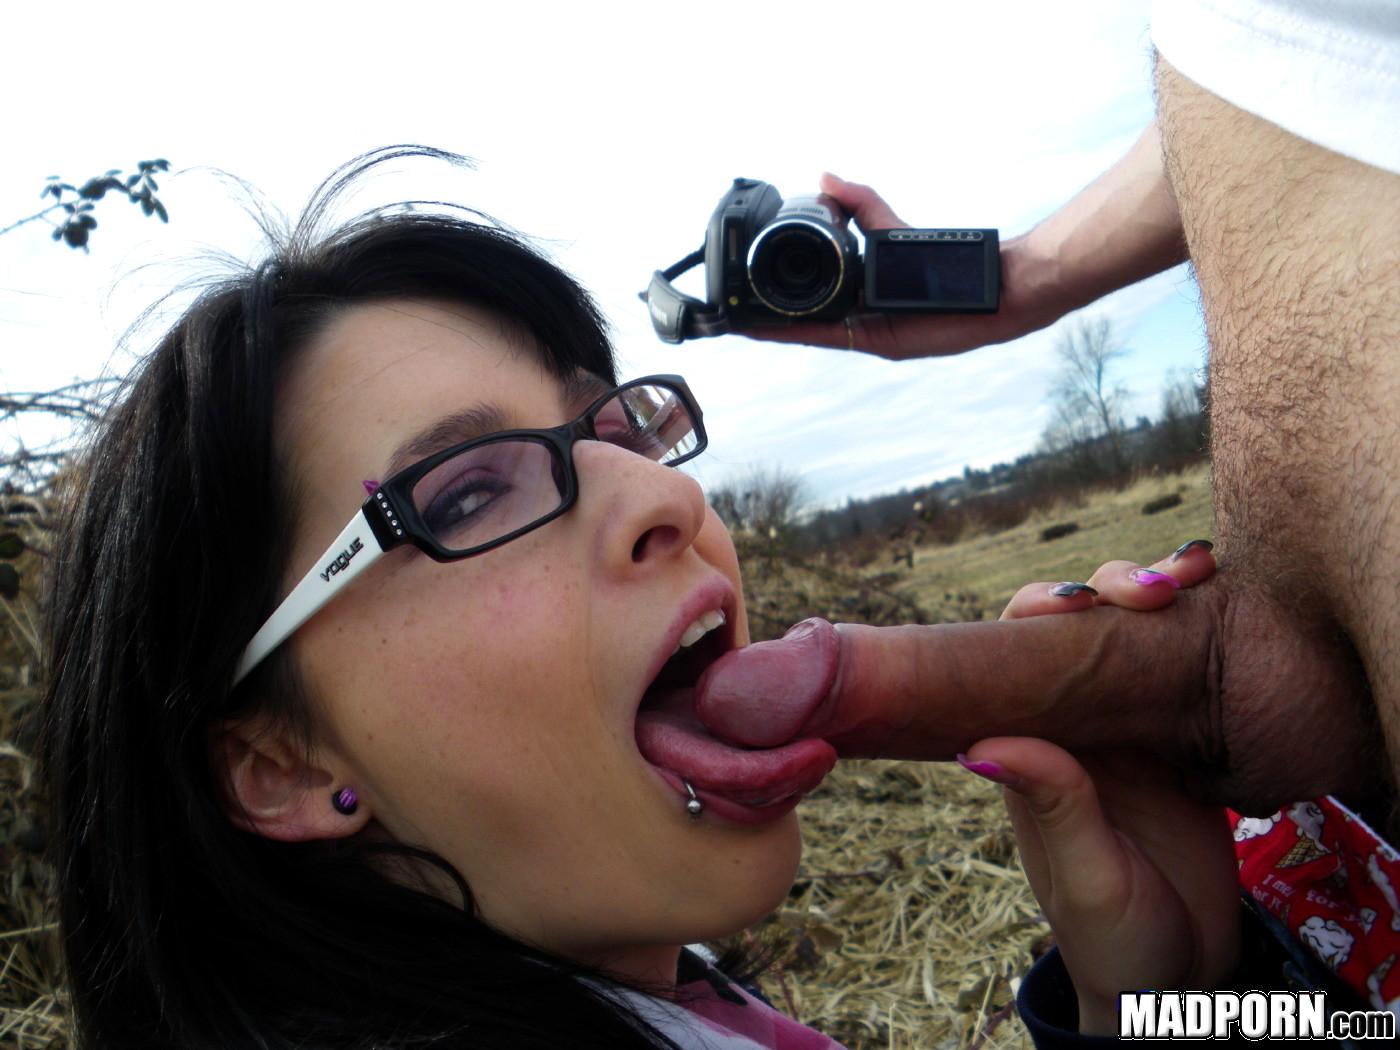 Amatur outdoor sex video blowjob — photo 4